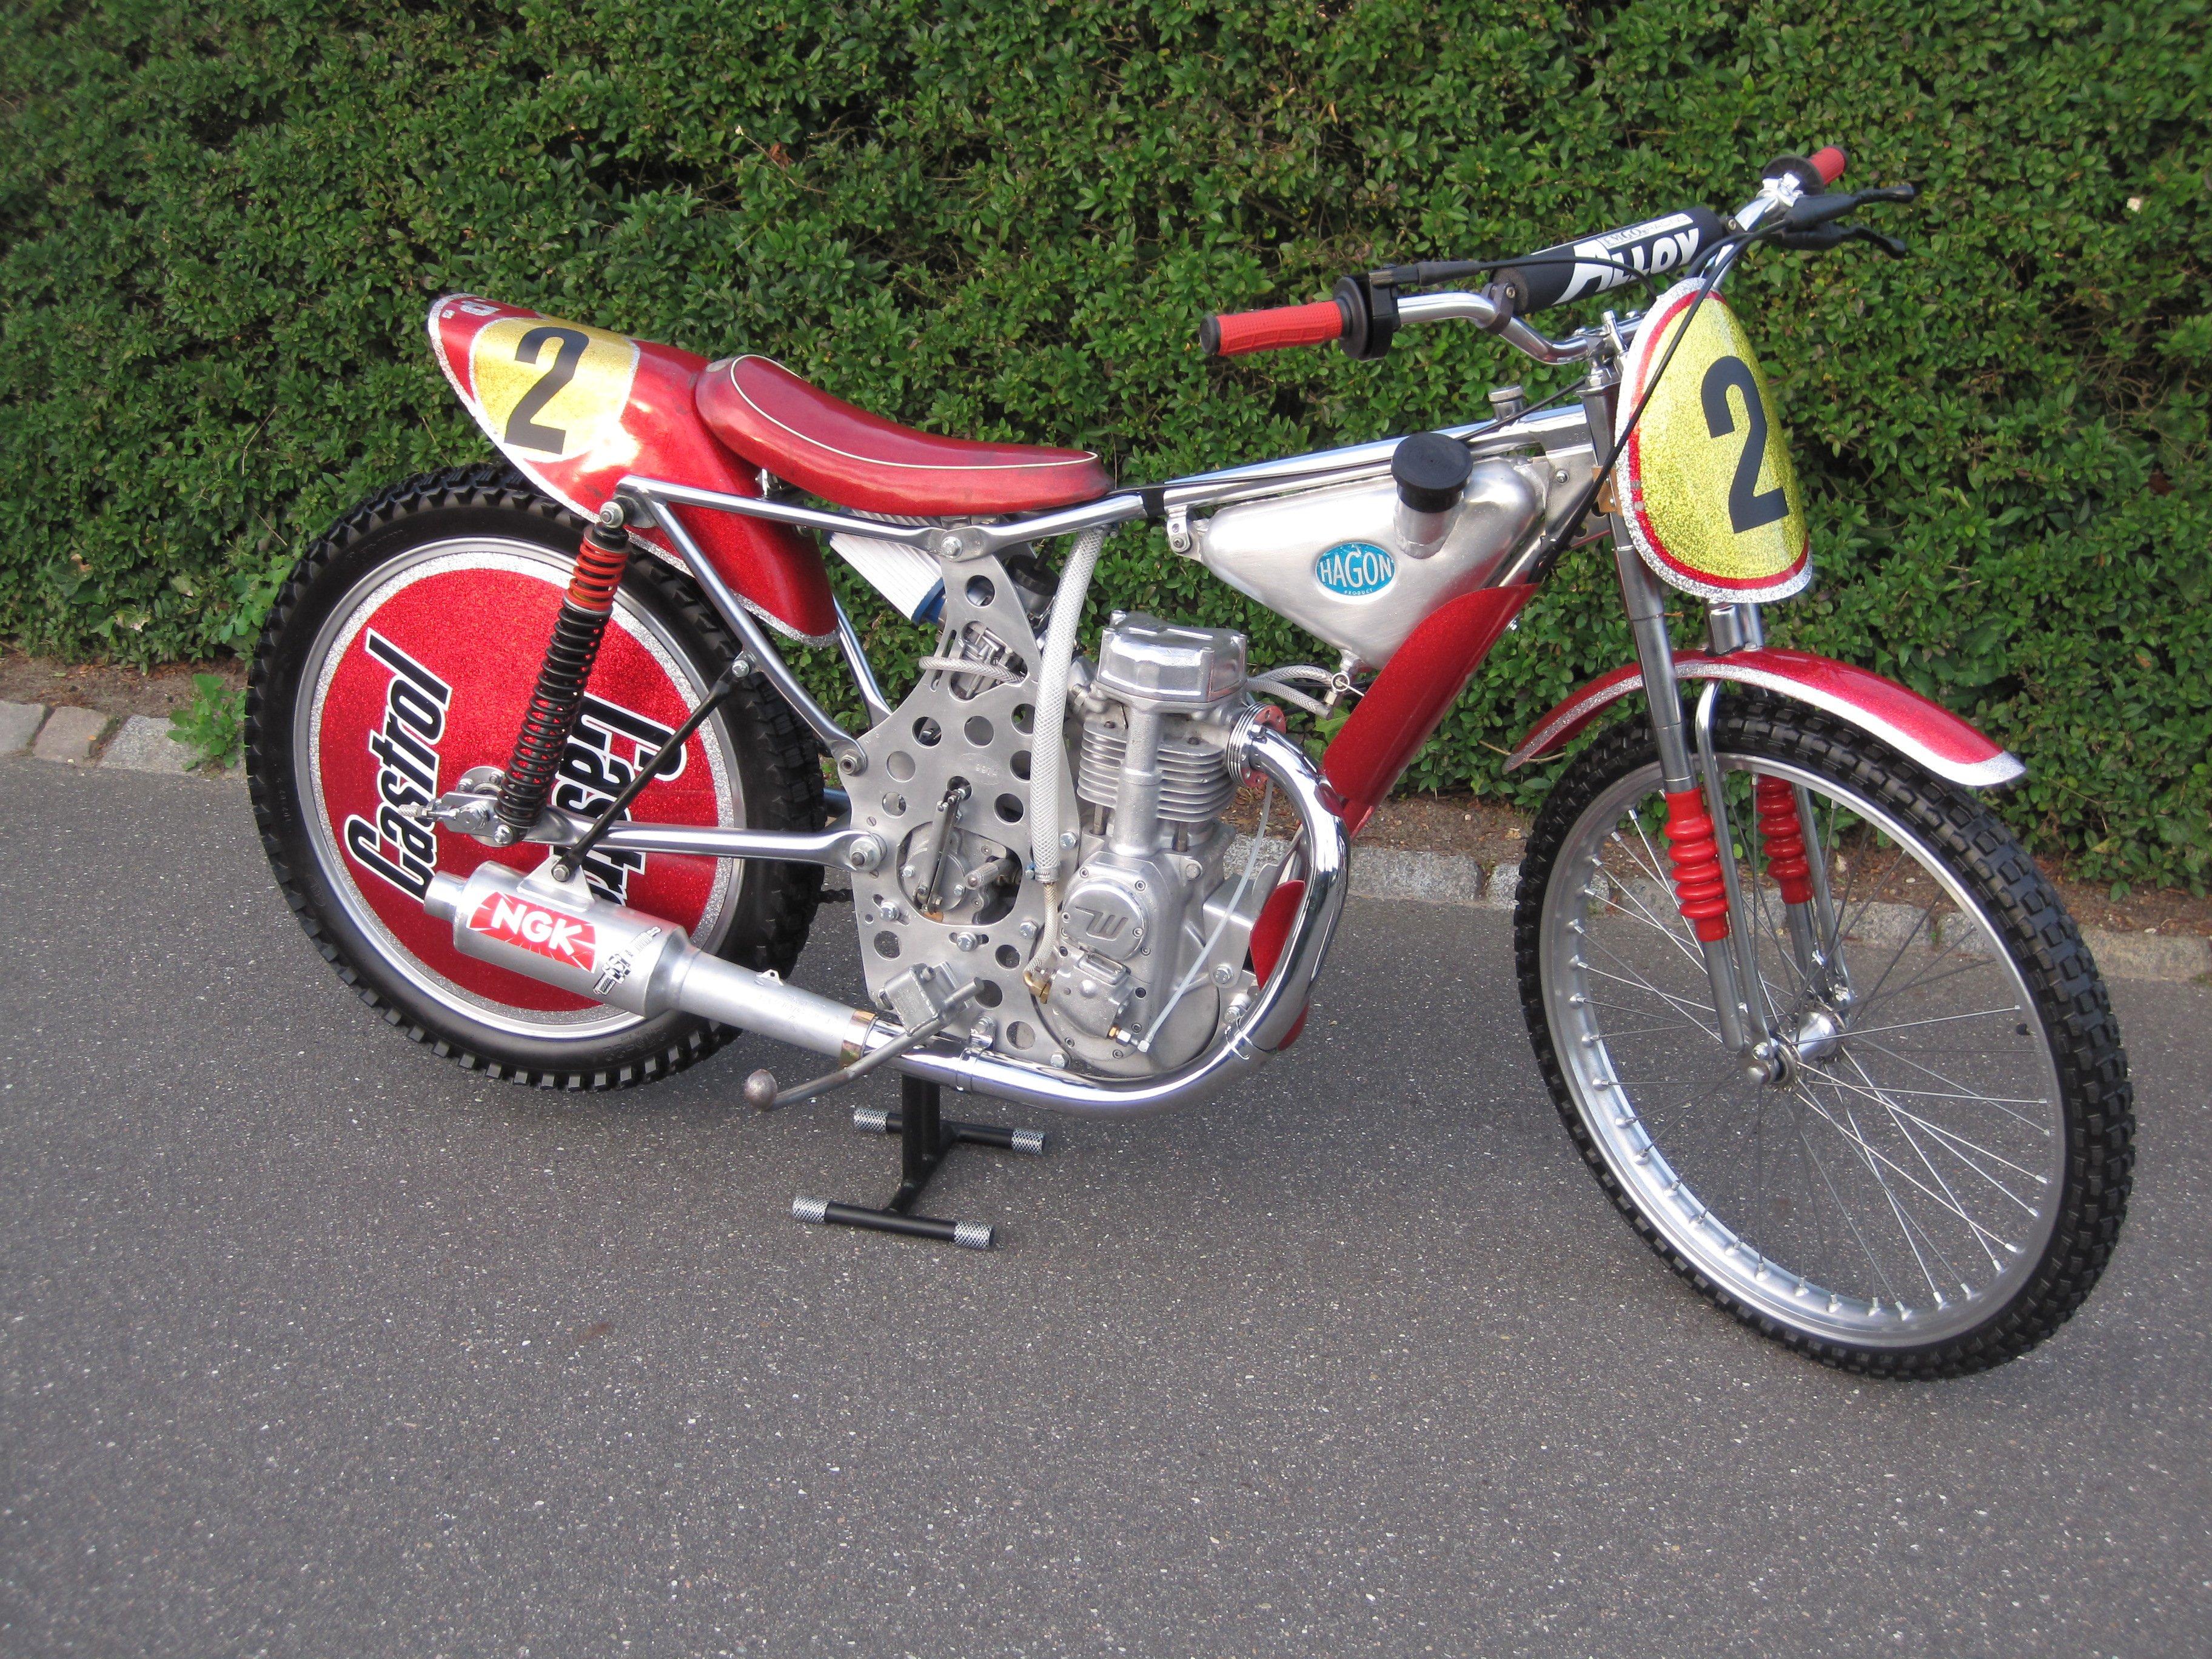 Speedway Motorcycle Racing Bikes: Bikes Page 6